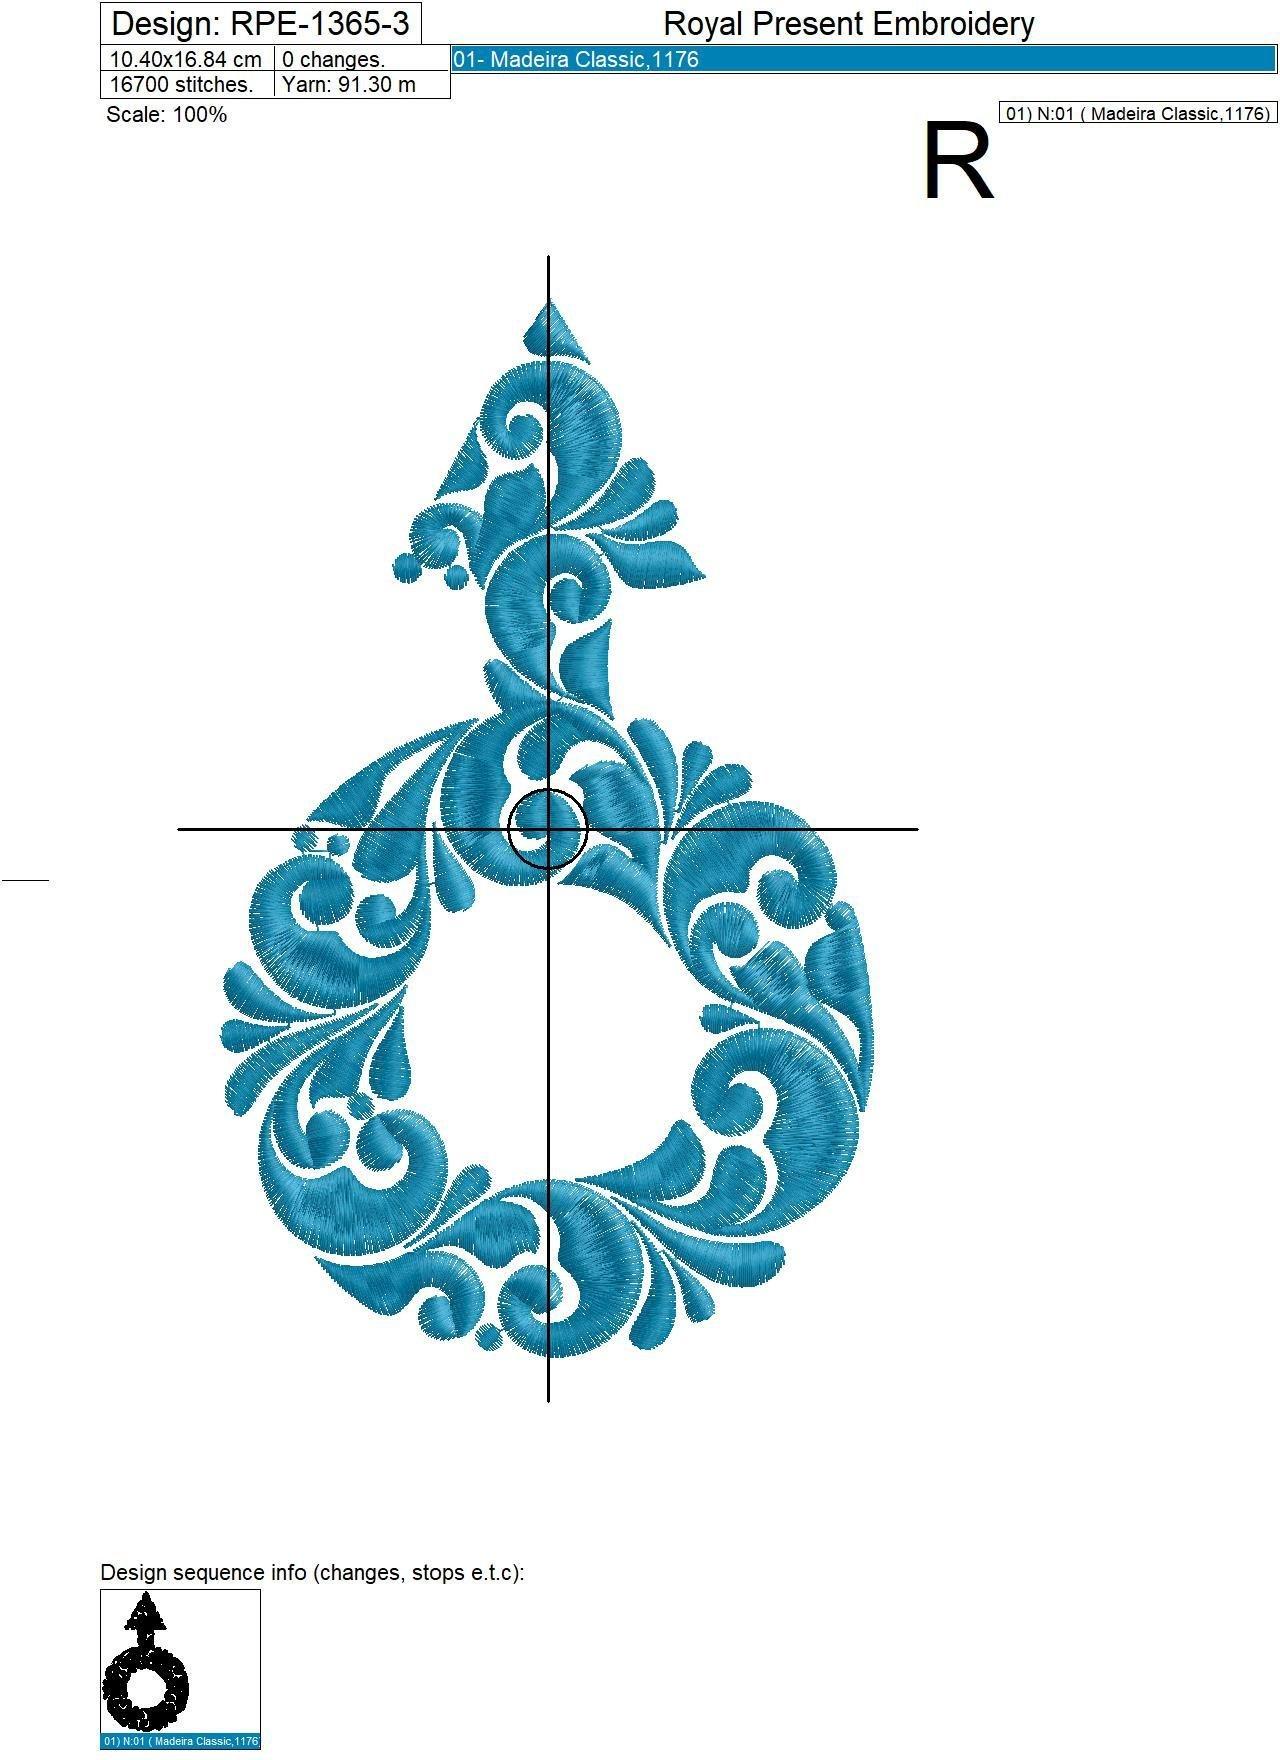 Female and Male symbols Machine Embroidery Designs